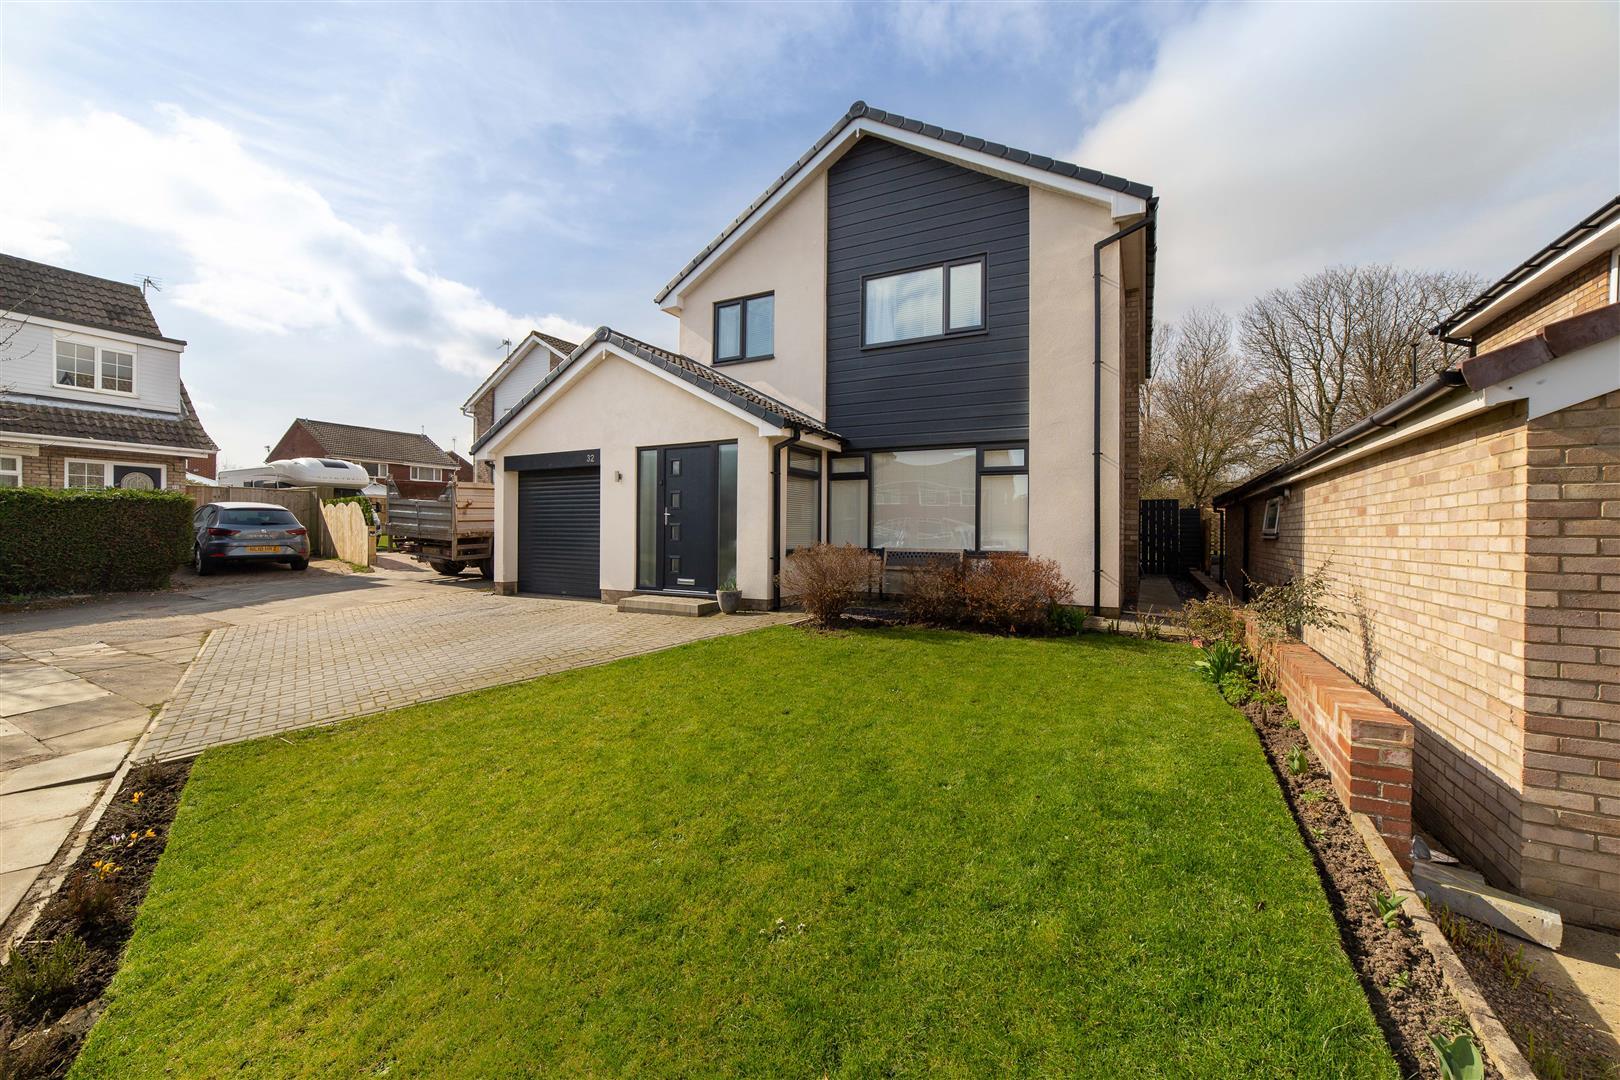 4 bed detached house for sale in Huntingdon Close, Kingston Park, NE3